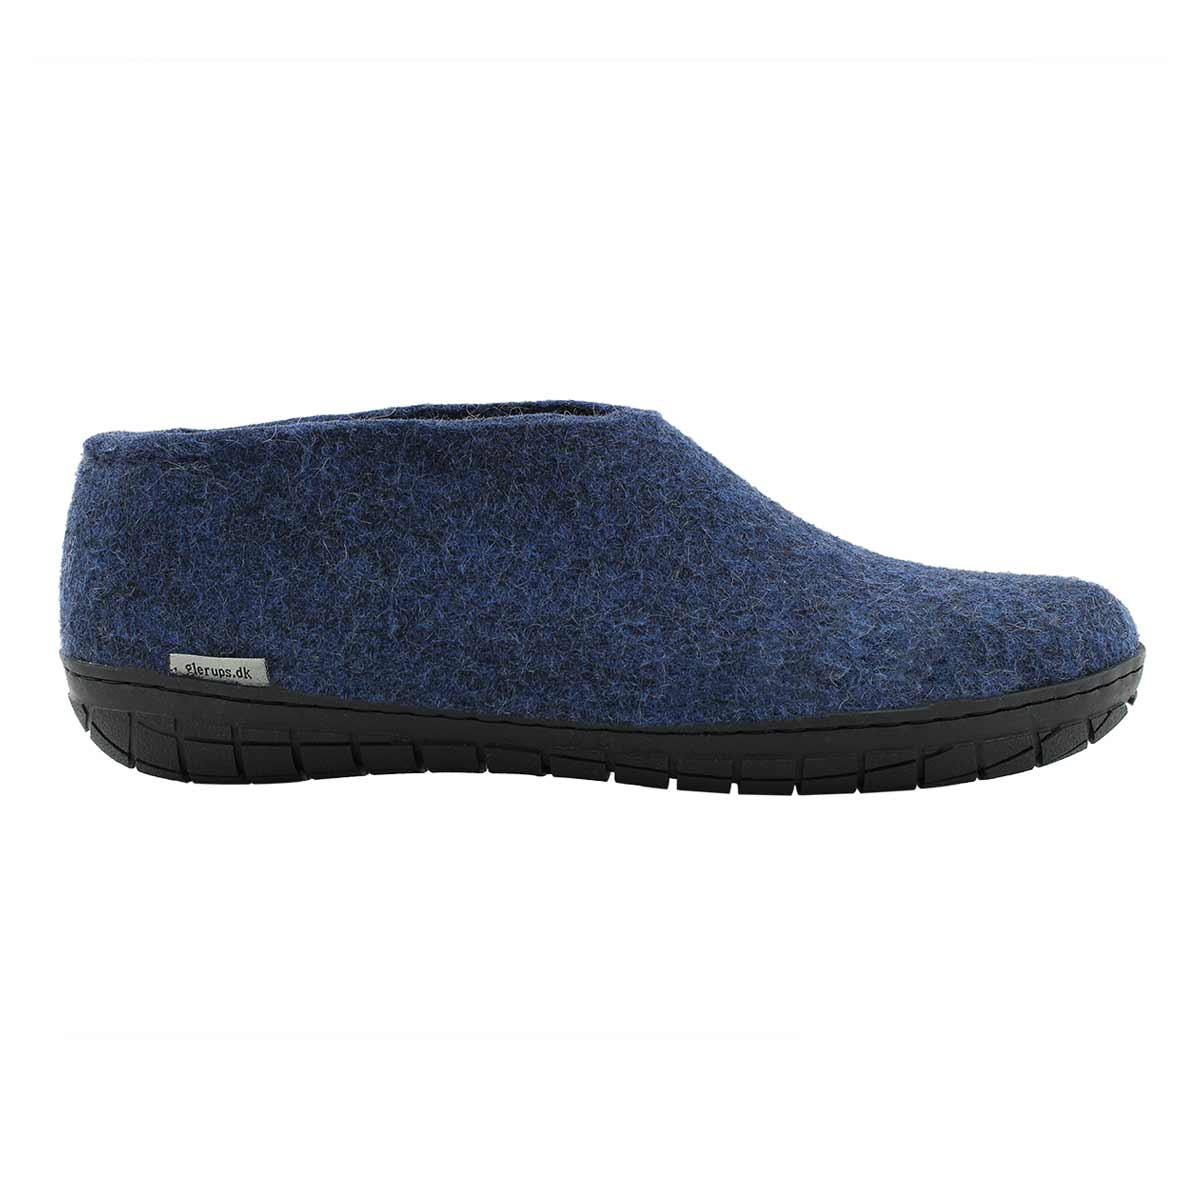 Mns Model AR denim closed back slippers